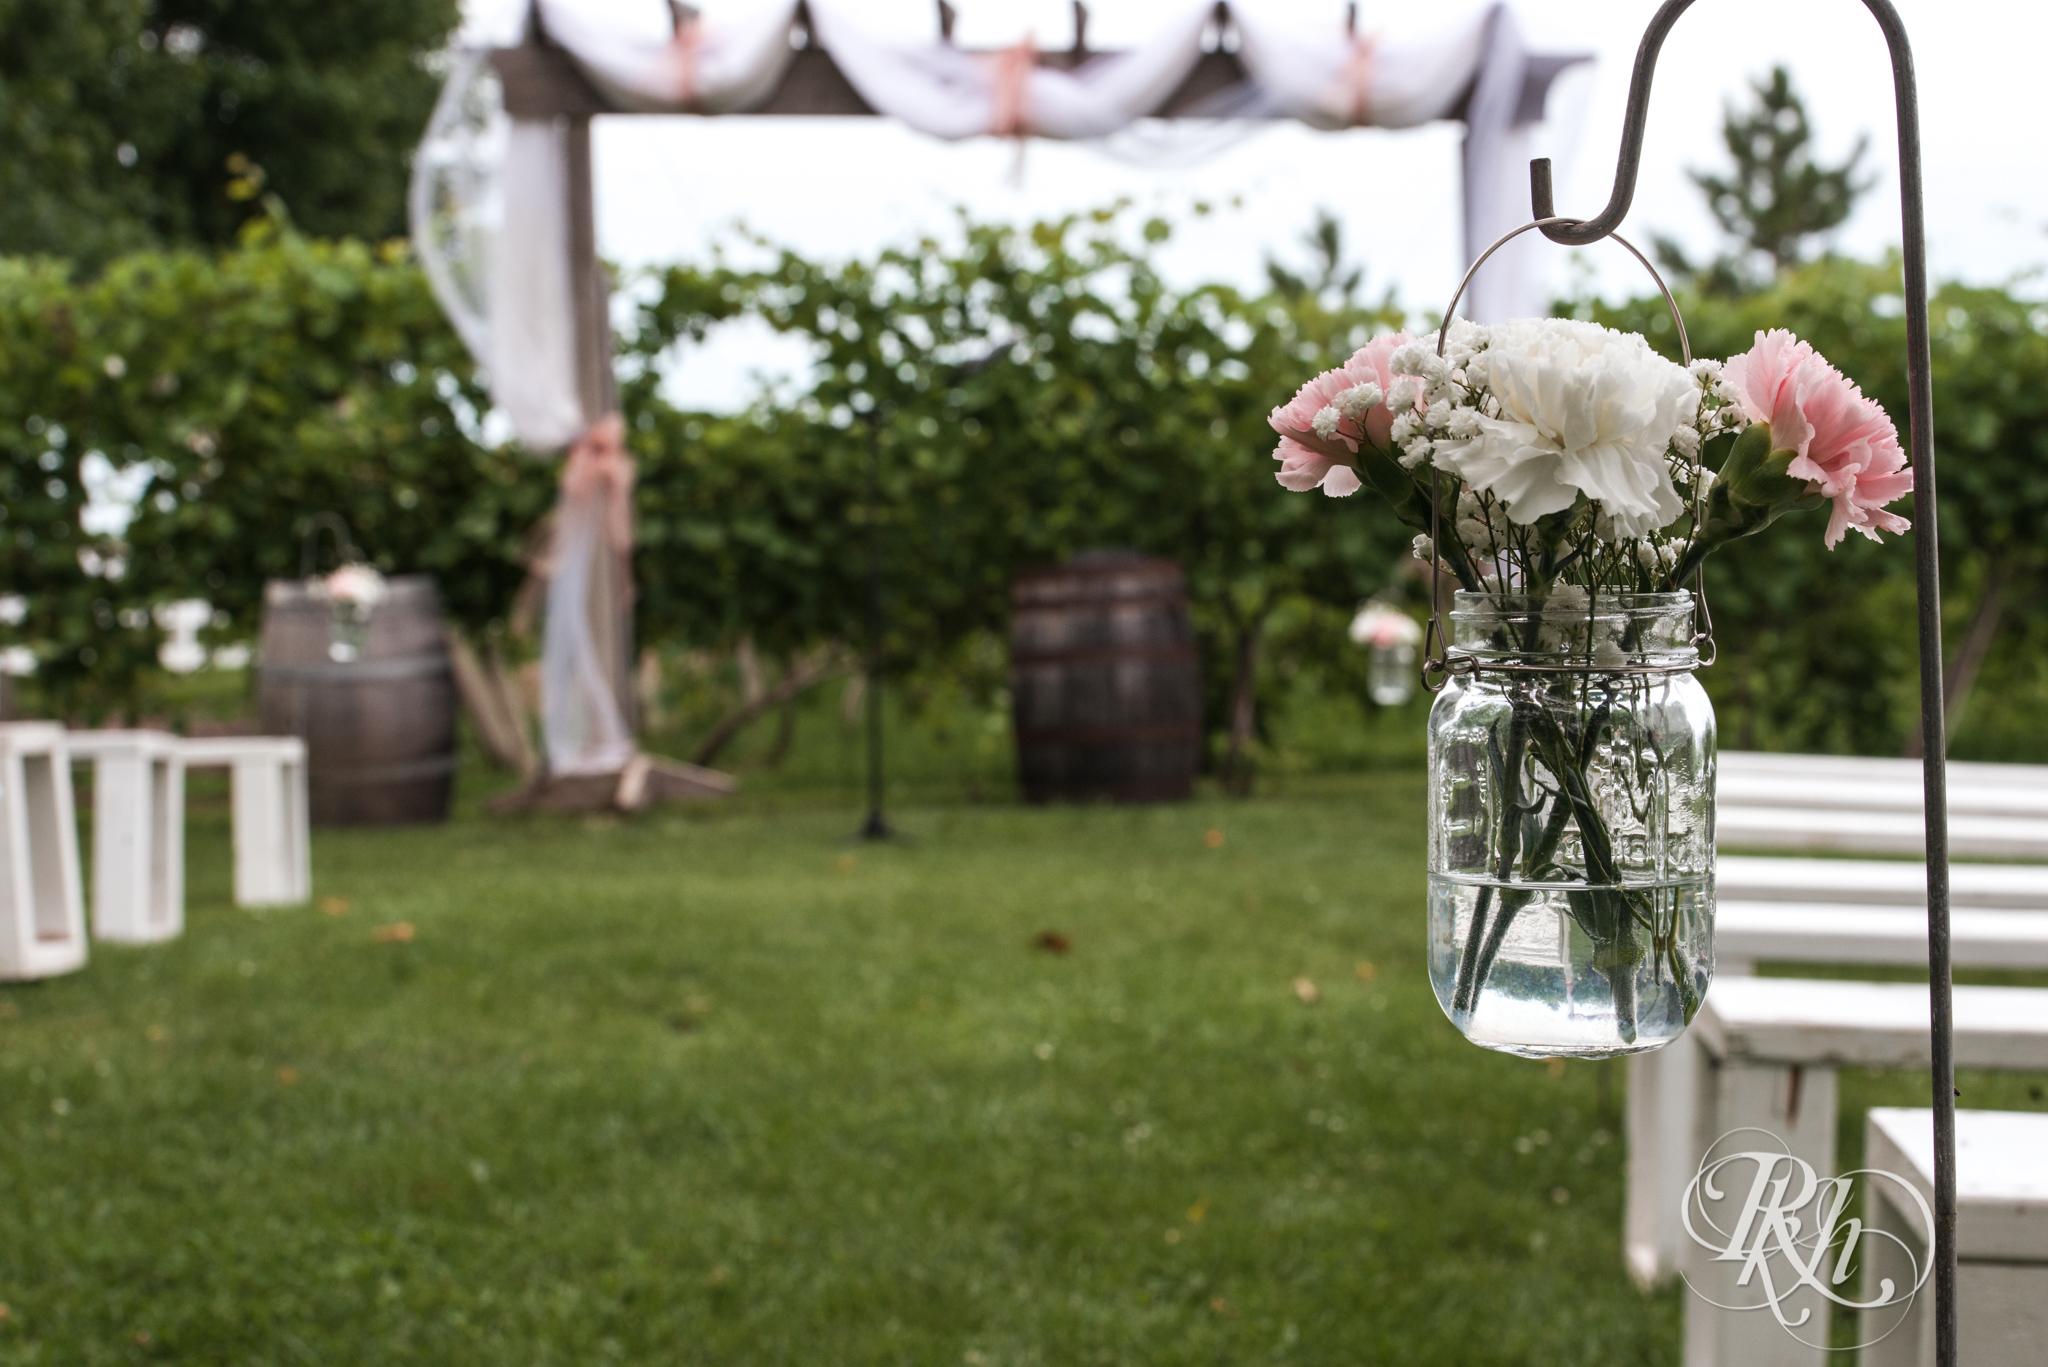 Ally & Nick - Minnesota Wedding Photography - Next Chapter Winery - RKH Images - Blog (4 of 57).jpg